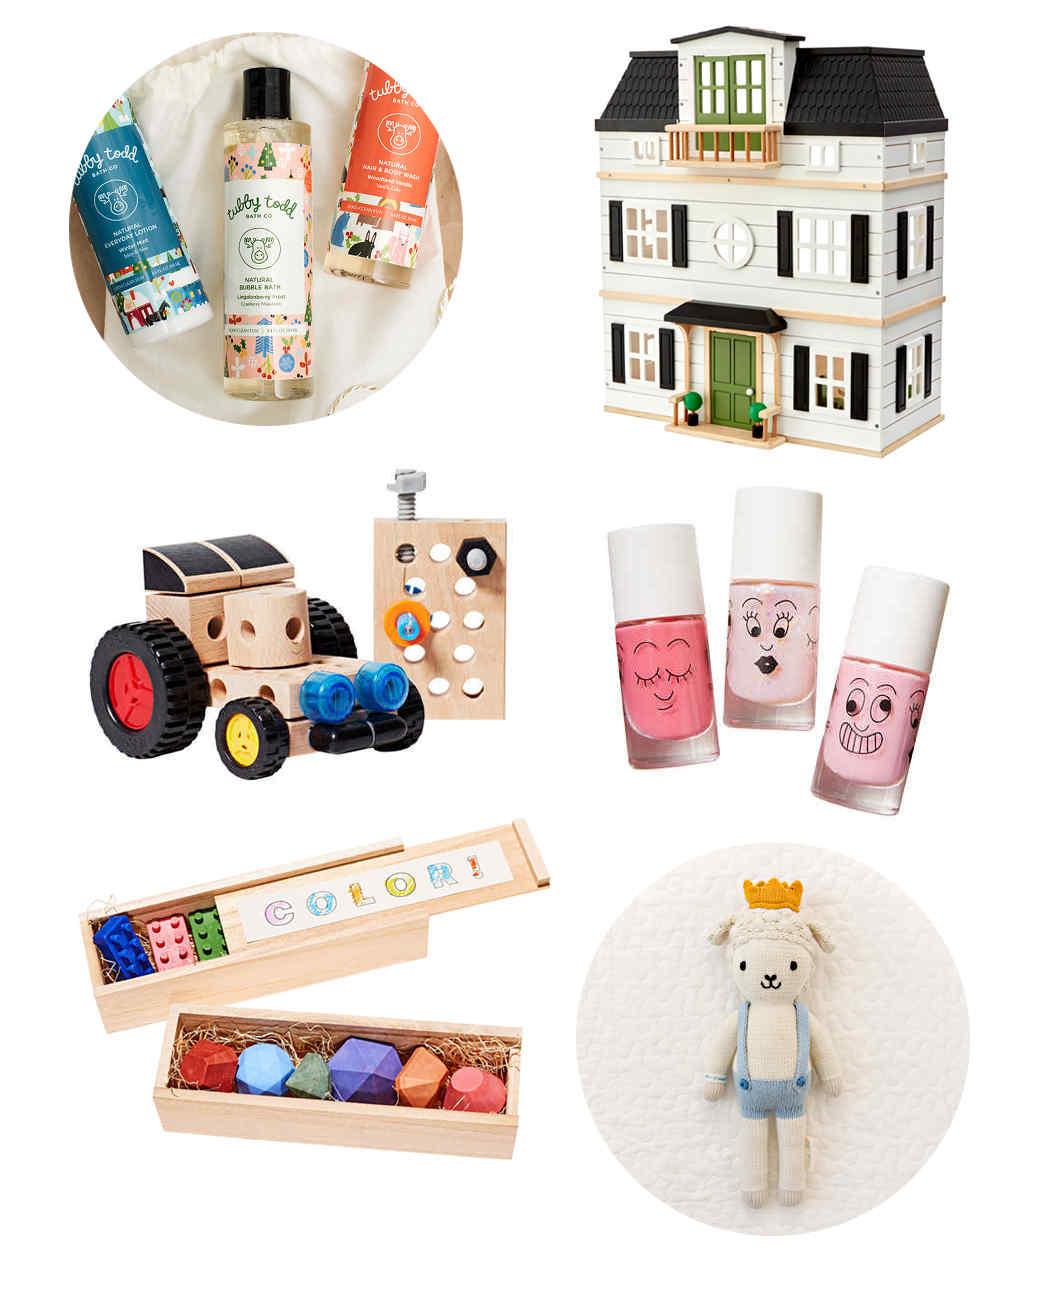 21 Gifts Your Kids Will Love | Martha Stewart Living